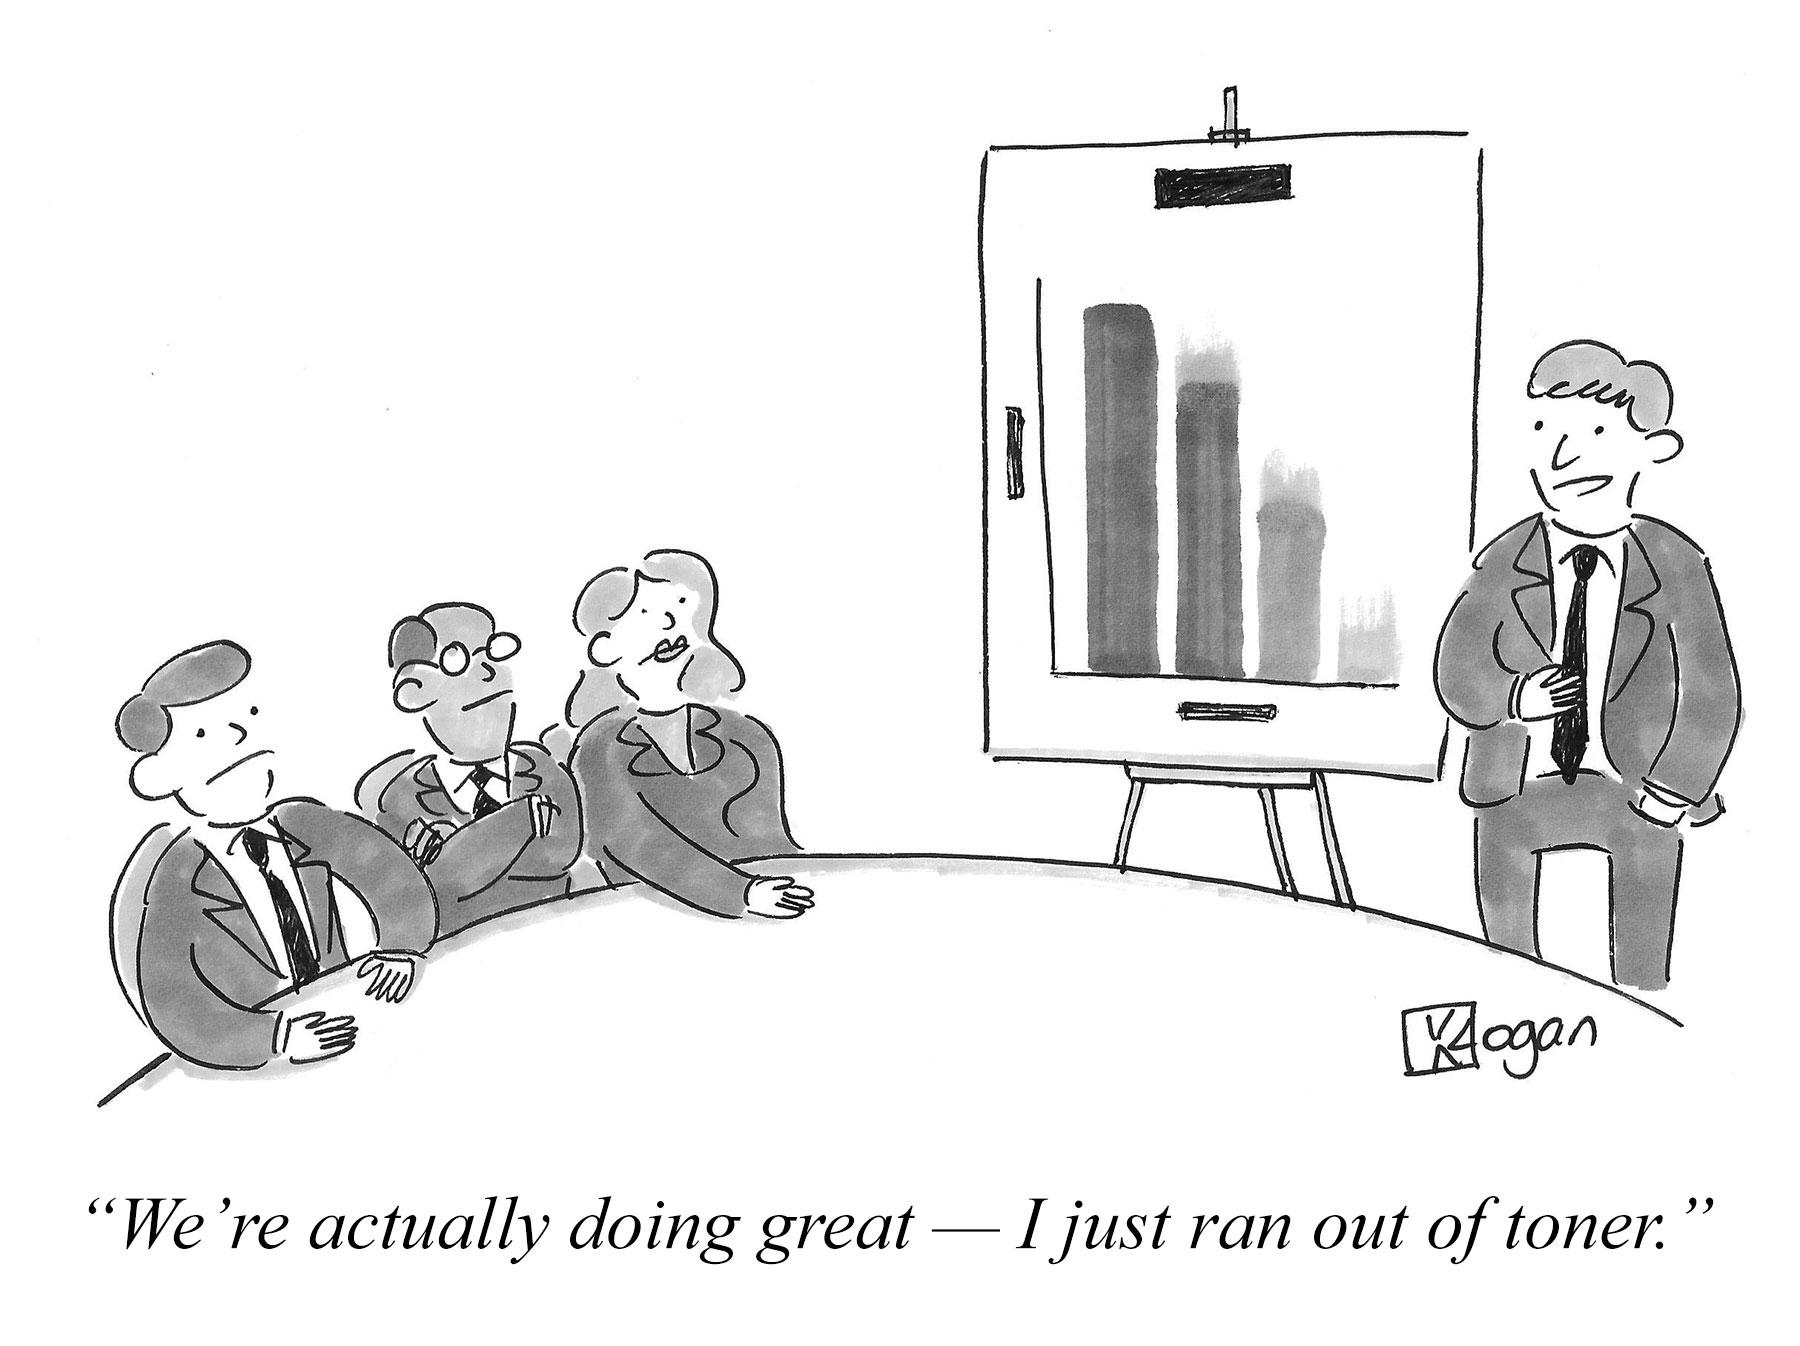 Cartoon about progress towards company goals.